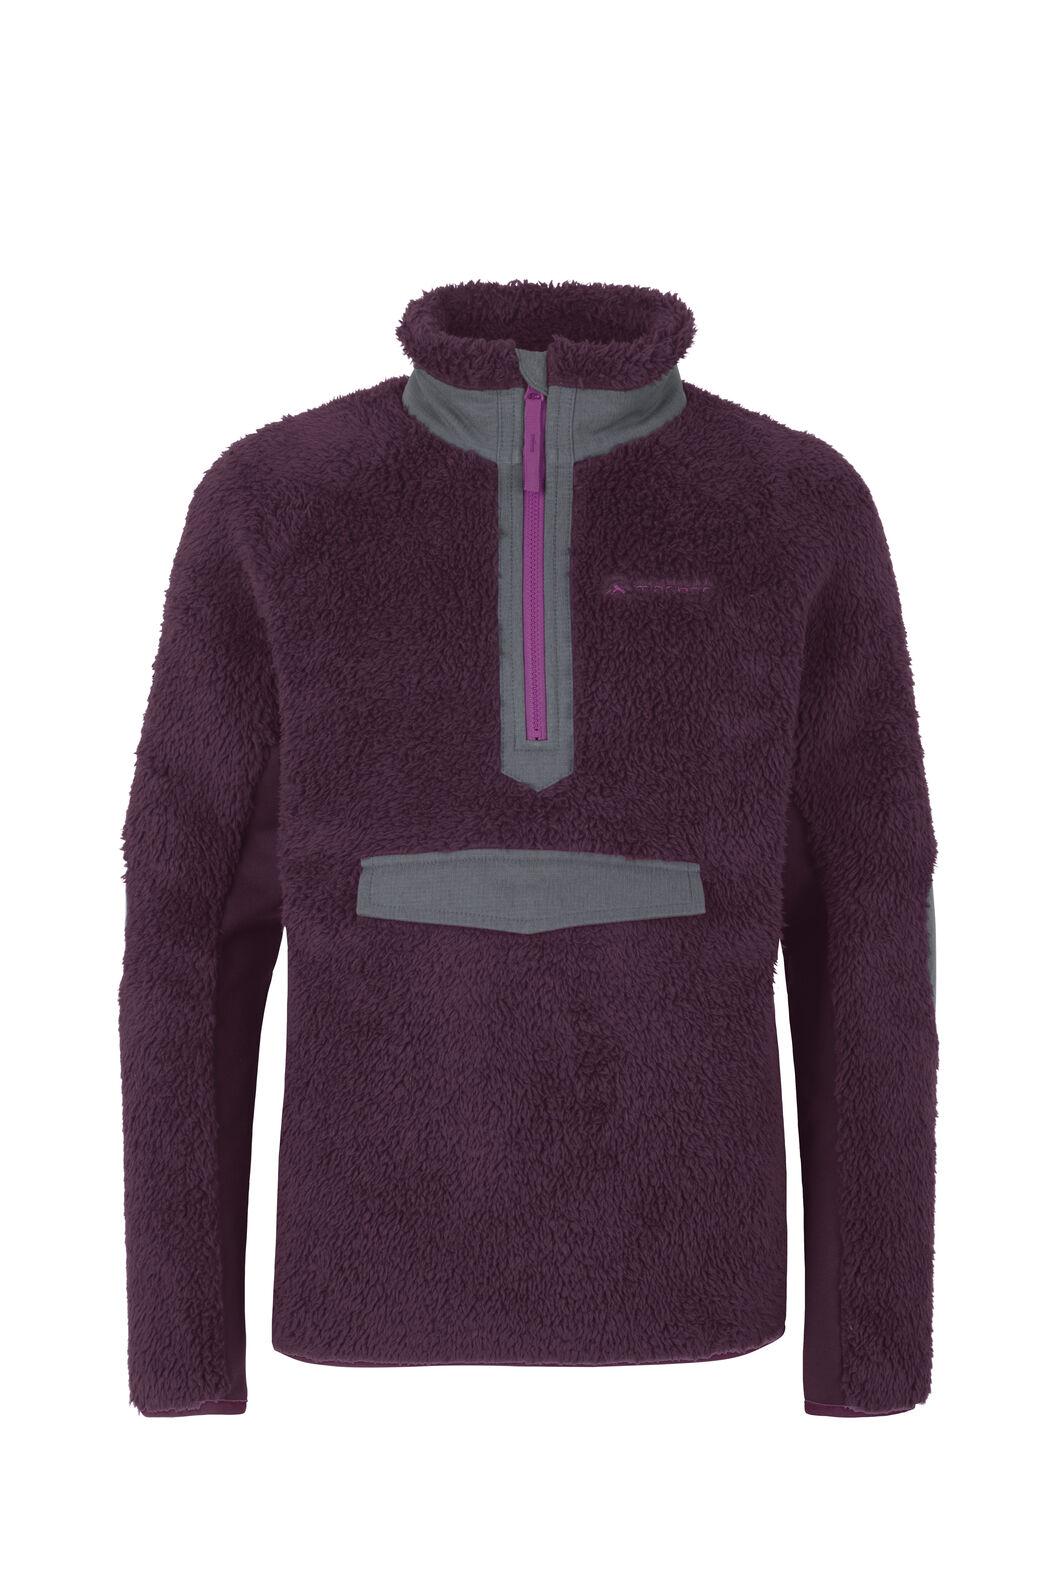 Macpac Sherpa Fleece - Kids', Potent Purple, hi-res